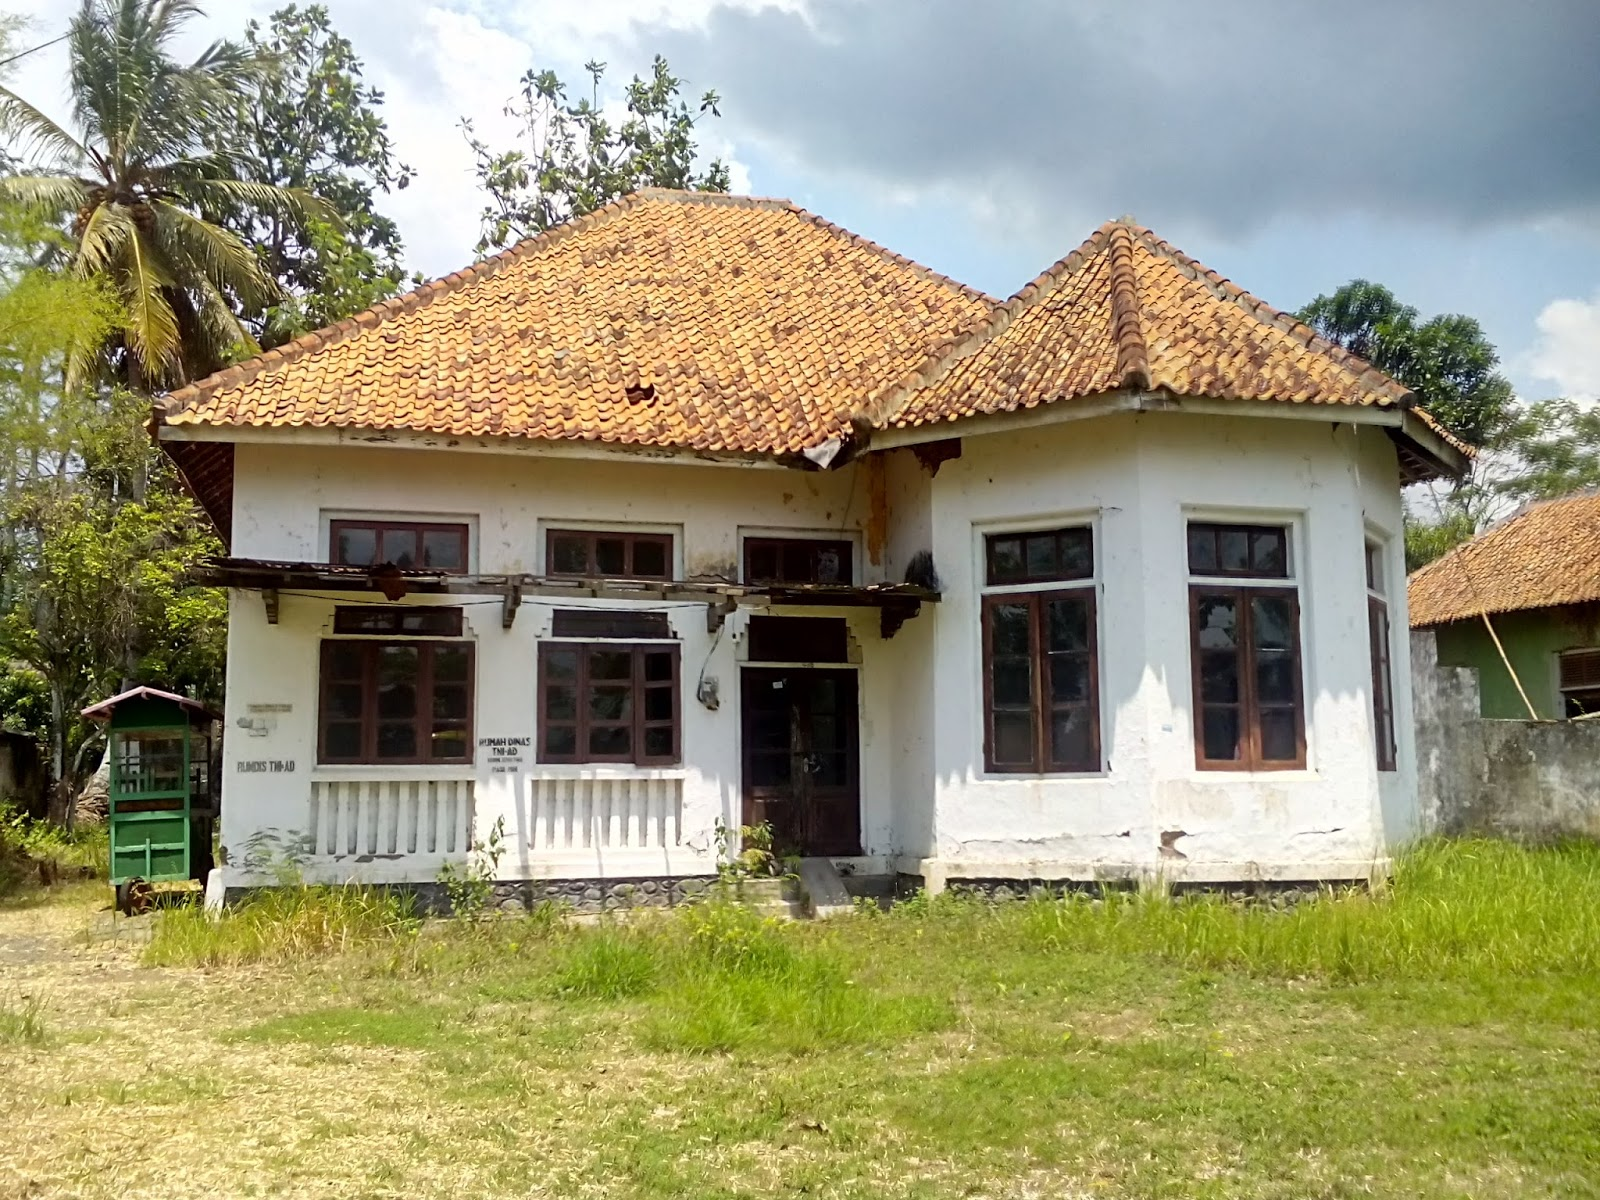 Rumah rumah bergaya kolonial dari berbagai penjuru